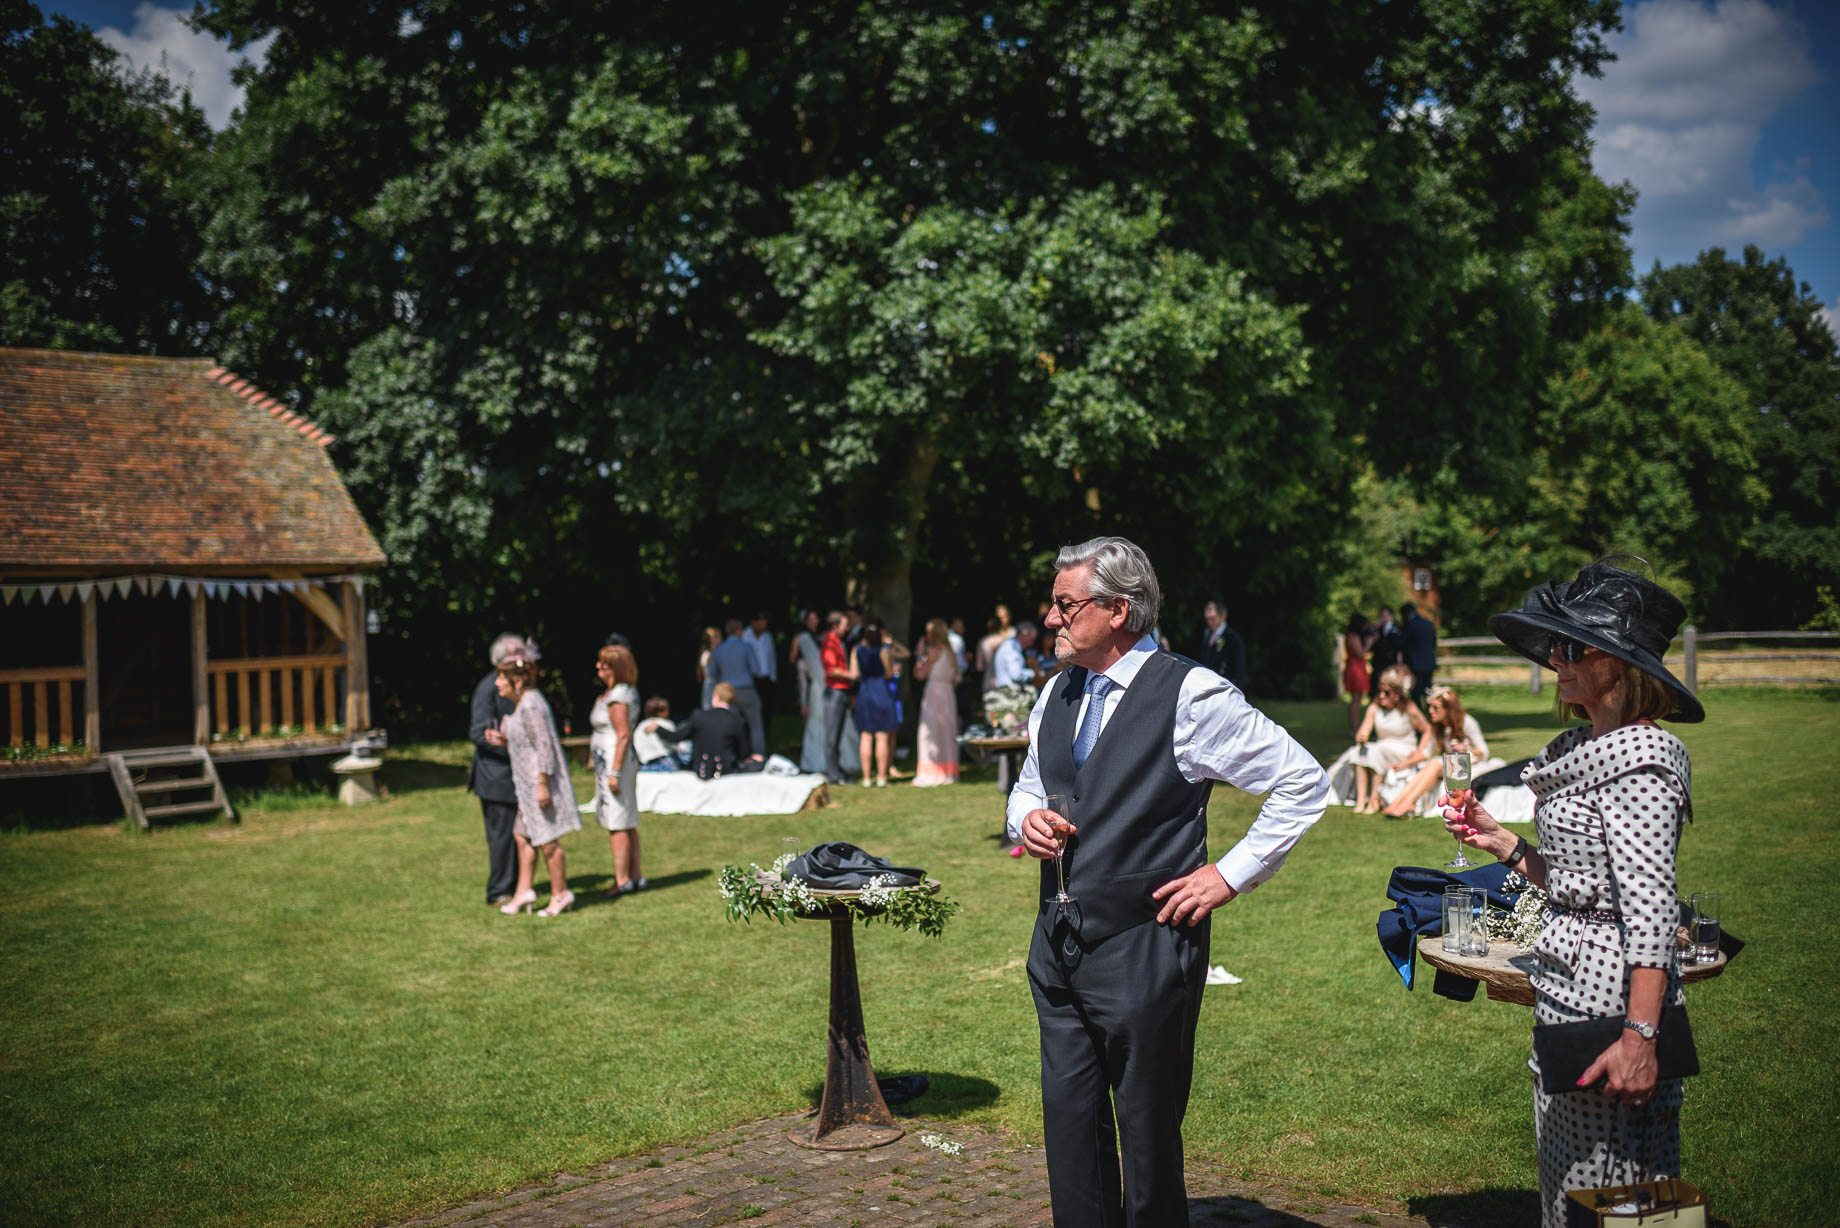 Gildings Barn wedding photography - Sarah and Steve (106 of 190)